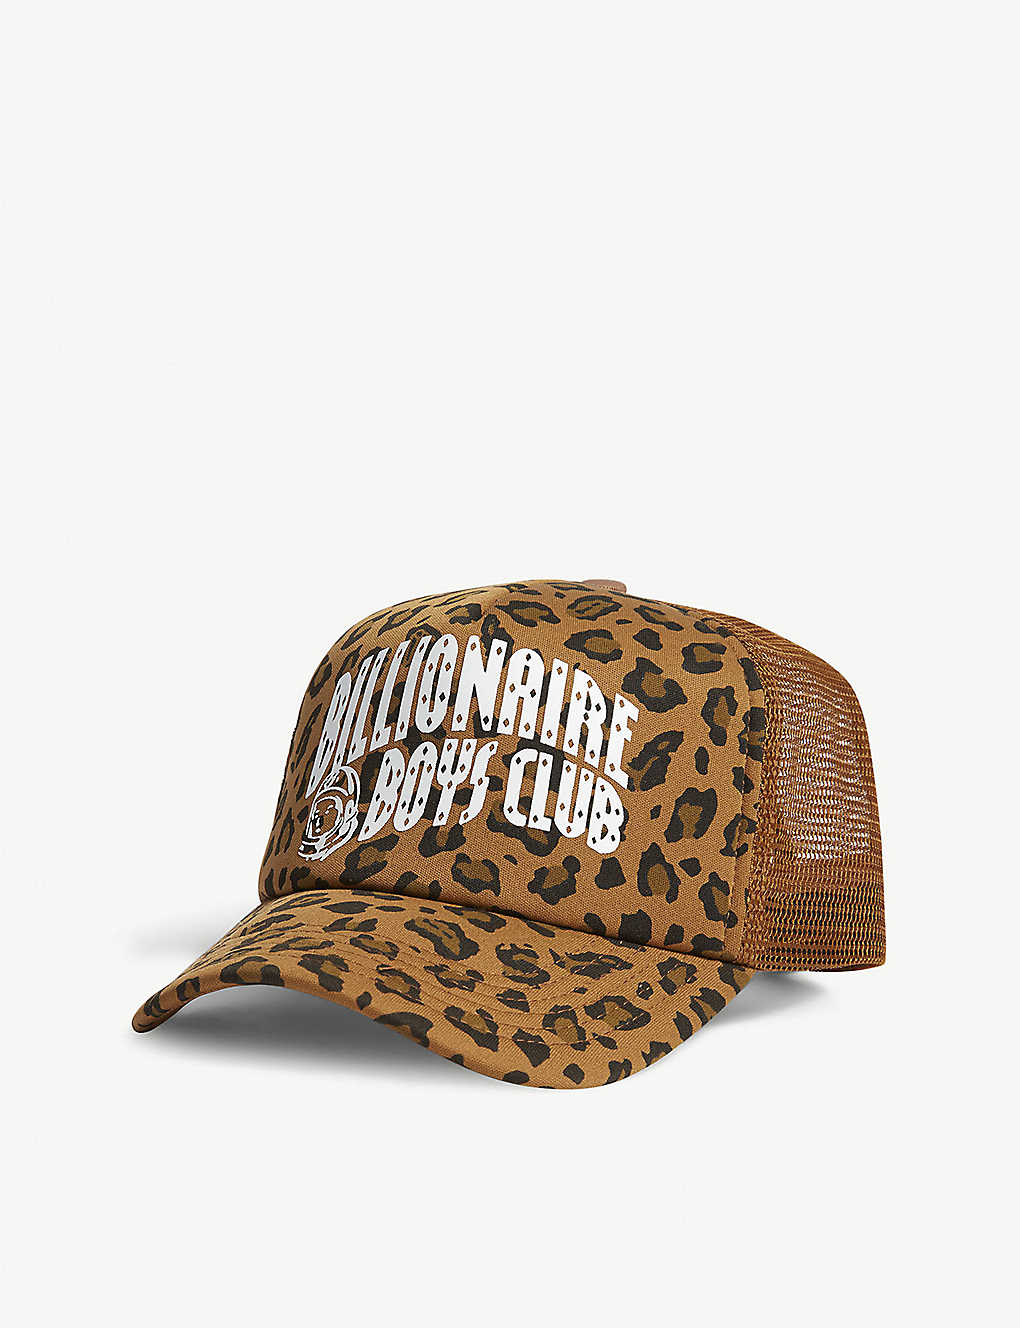 Leopard Print Trucker Cap In Green - Green Billionaire Boys Club jlX4E